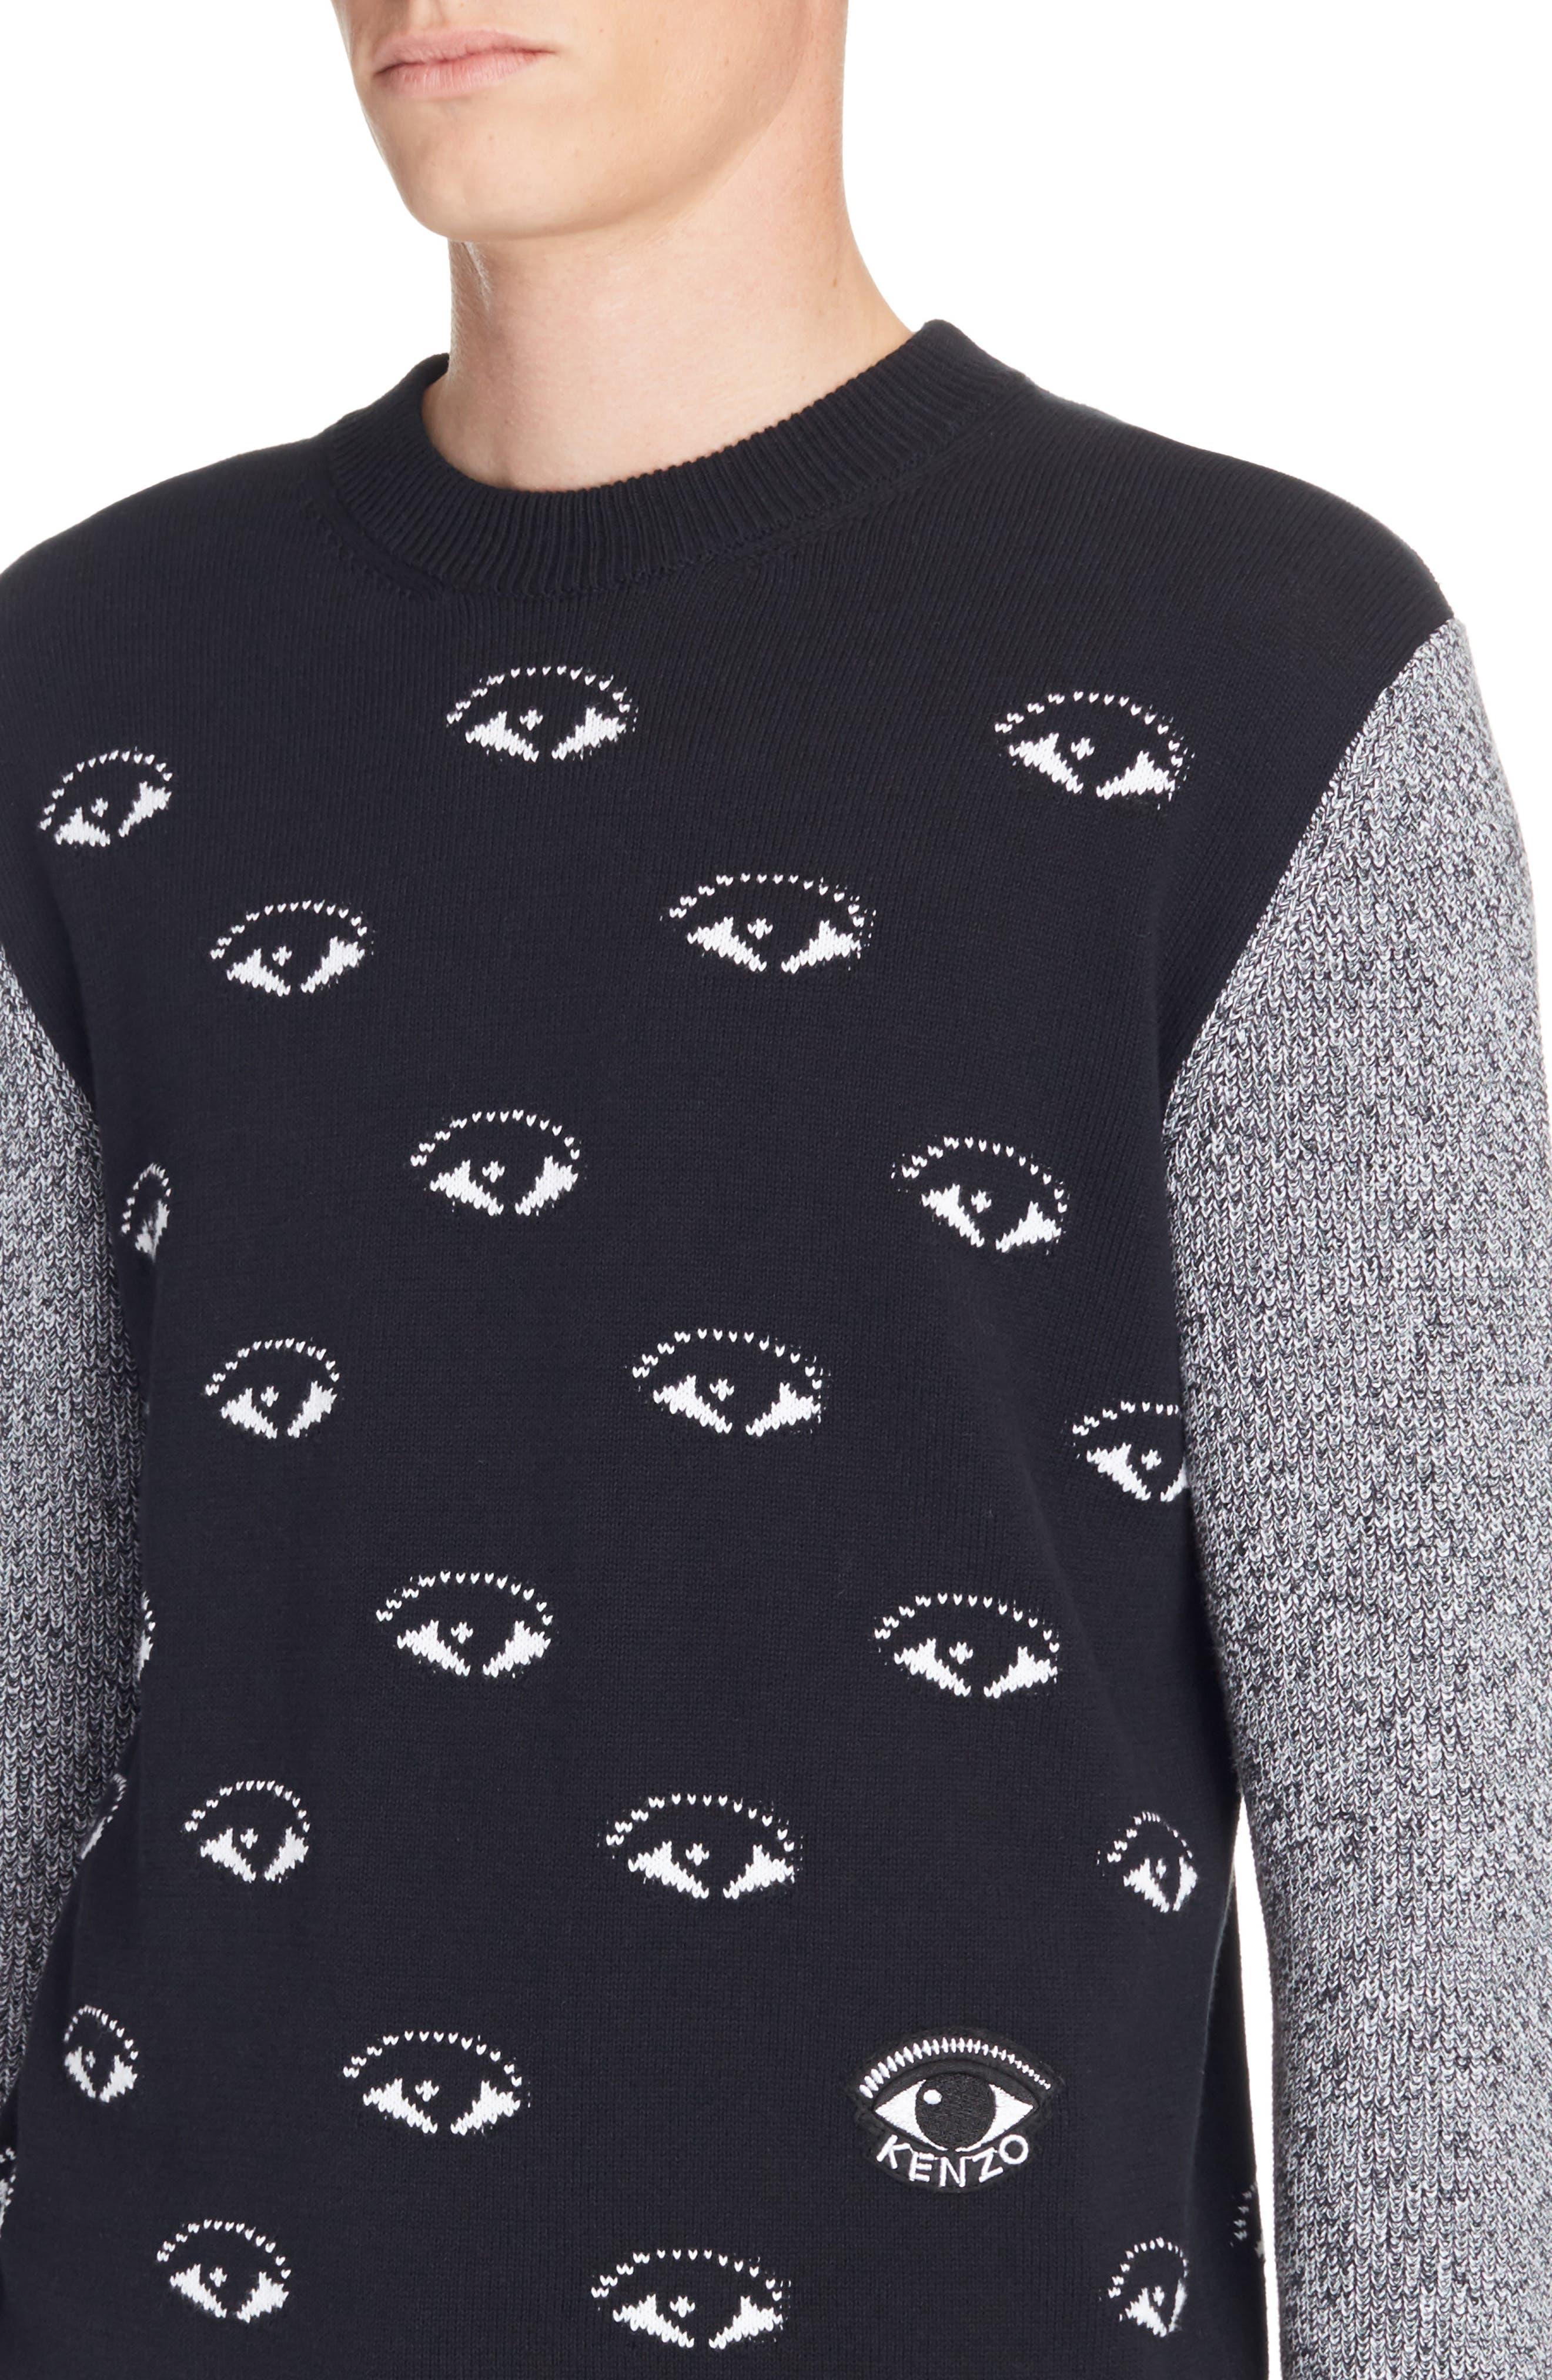 All Eyes Print Crewneck Sweater,                             Alternate thumbnail 4, color,                             001